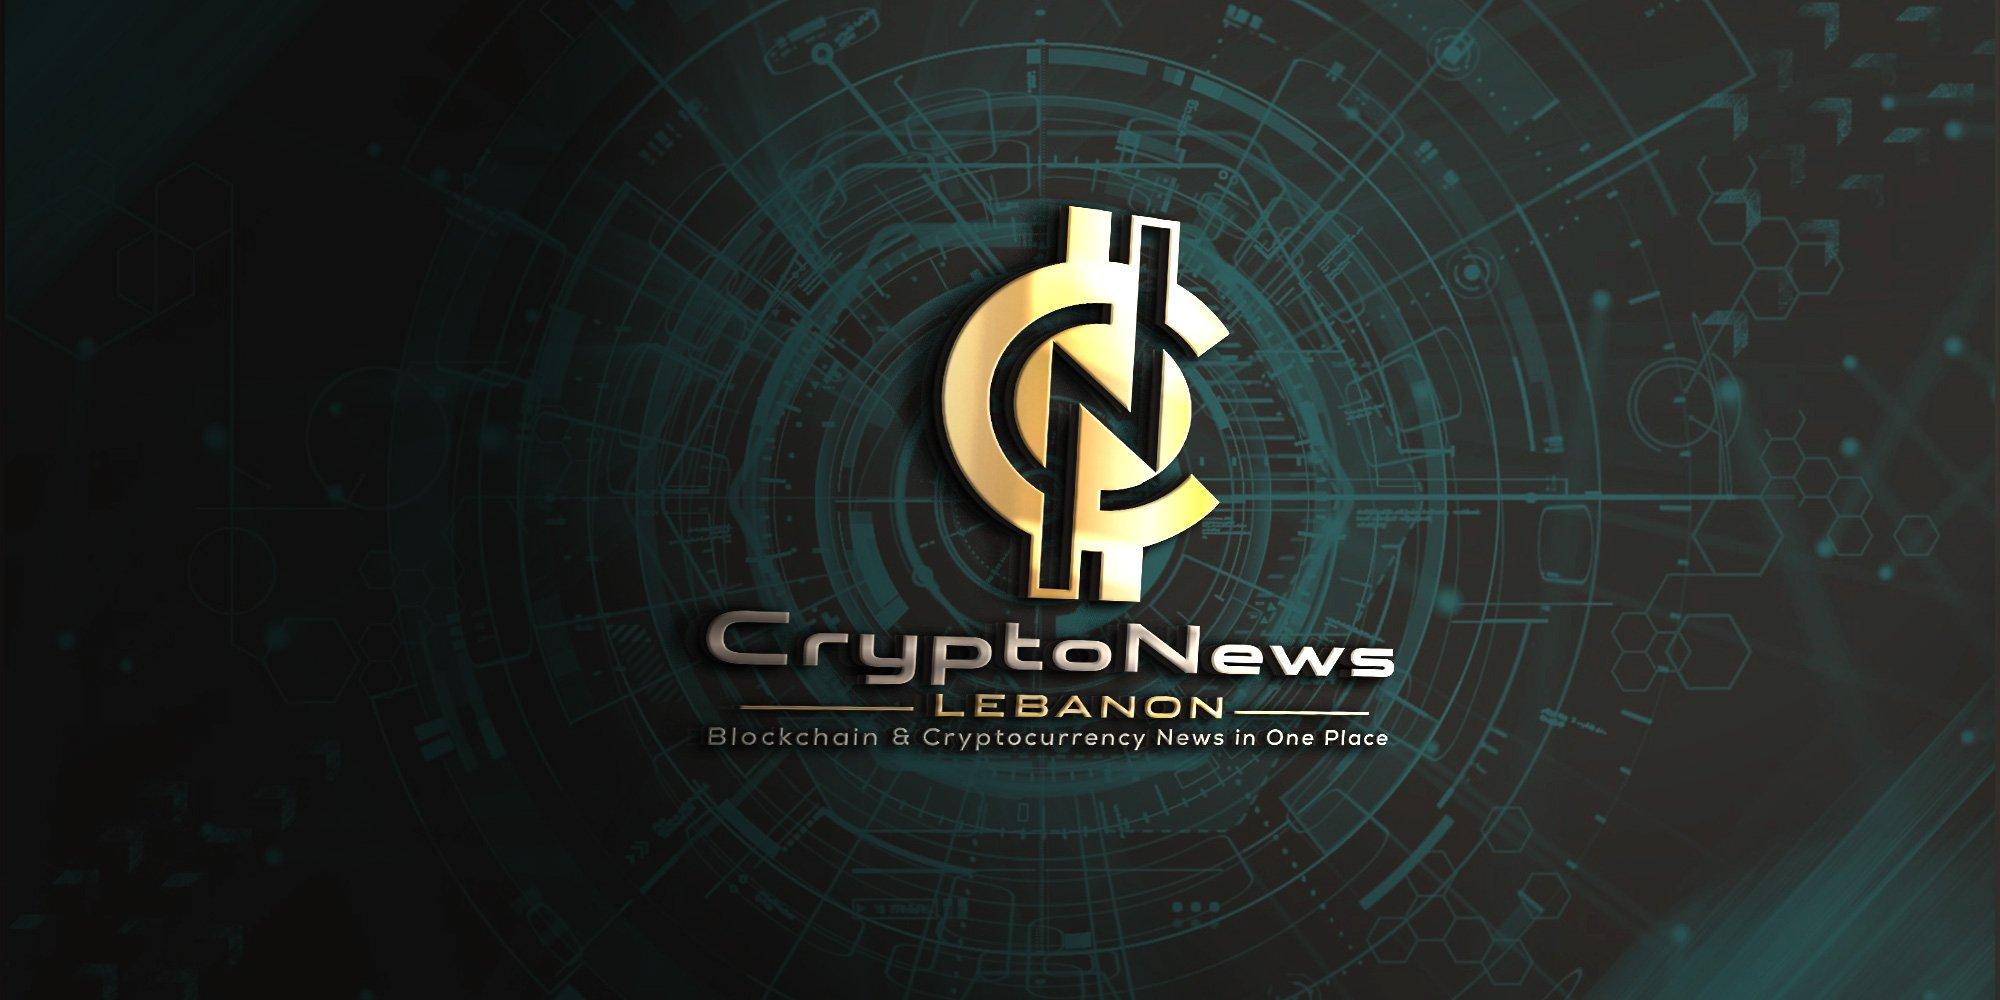 CryptoNews Lebanon